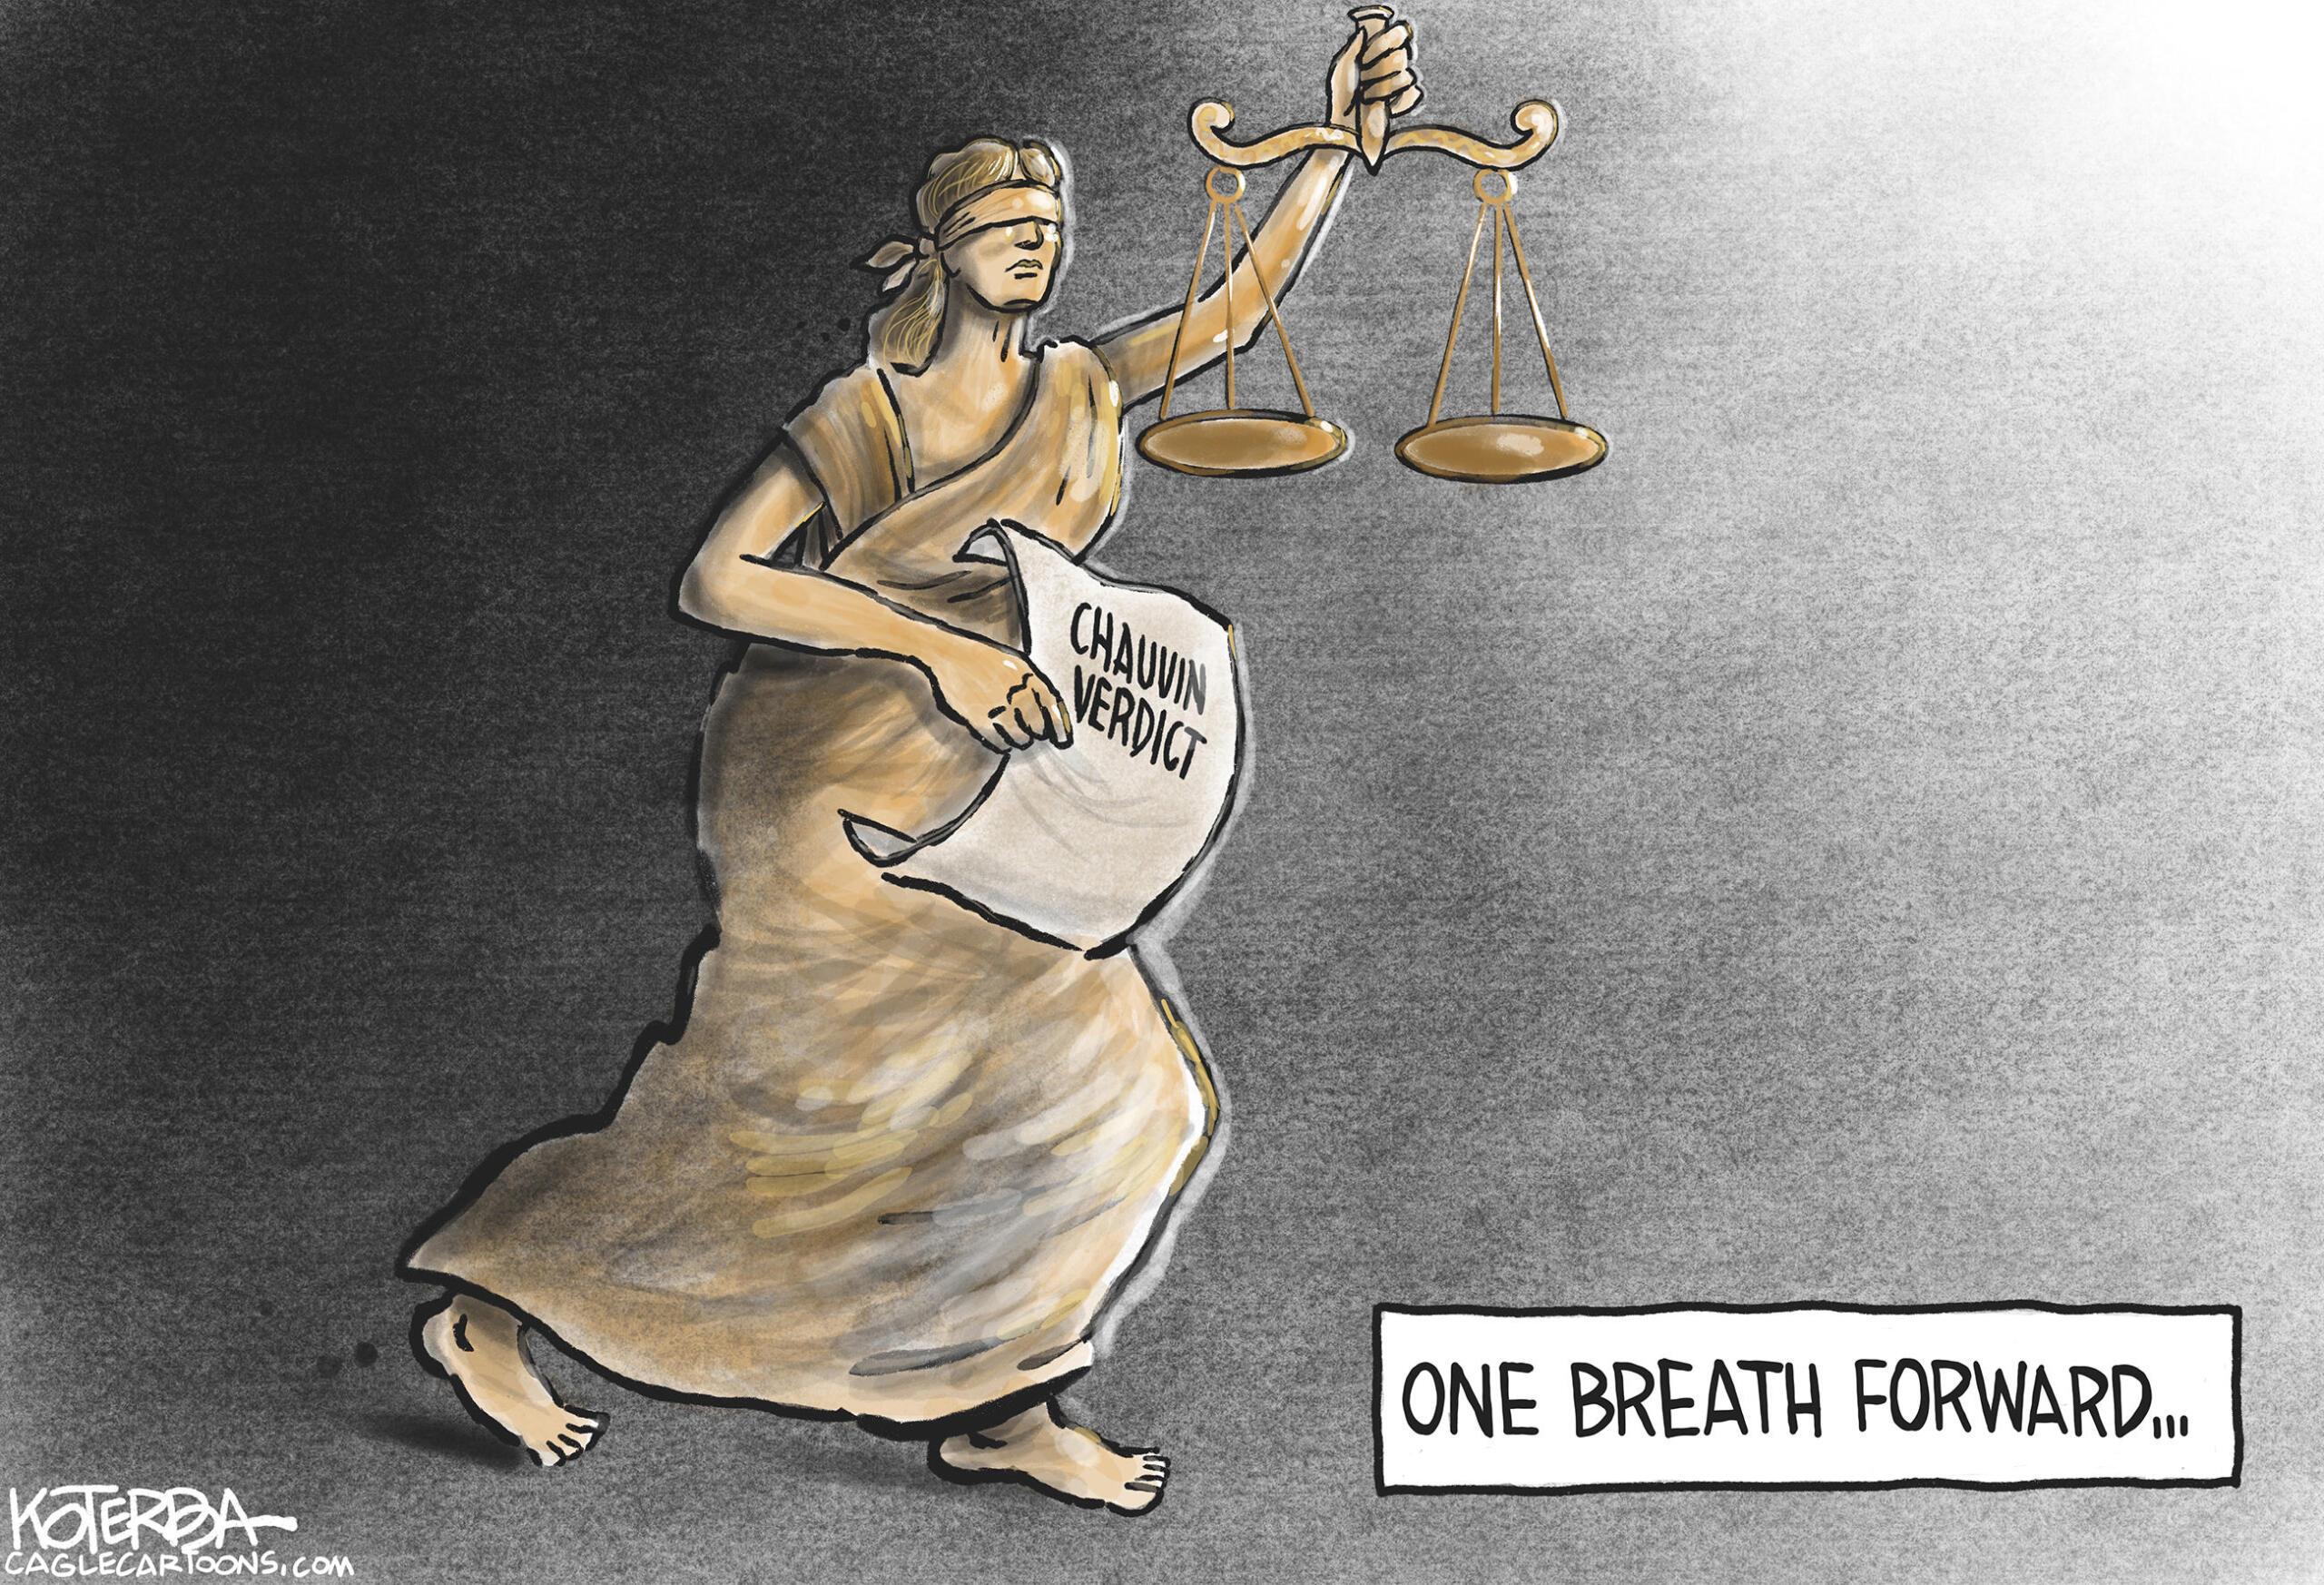 April 24: Chauvin Verdict